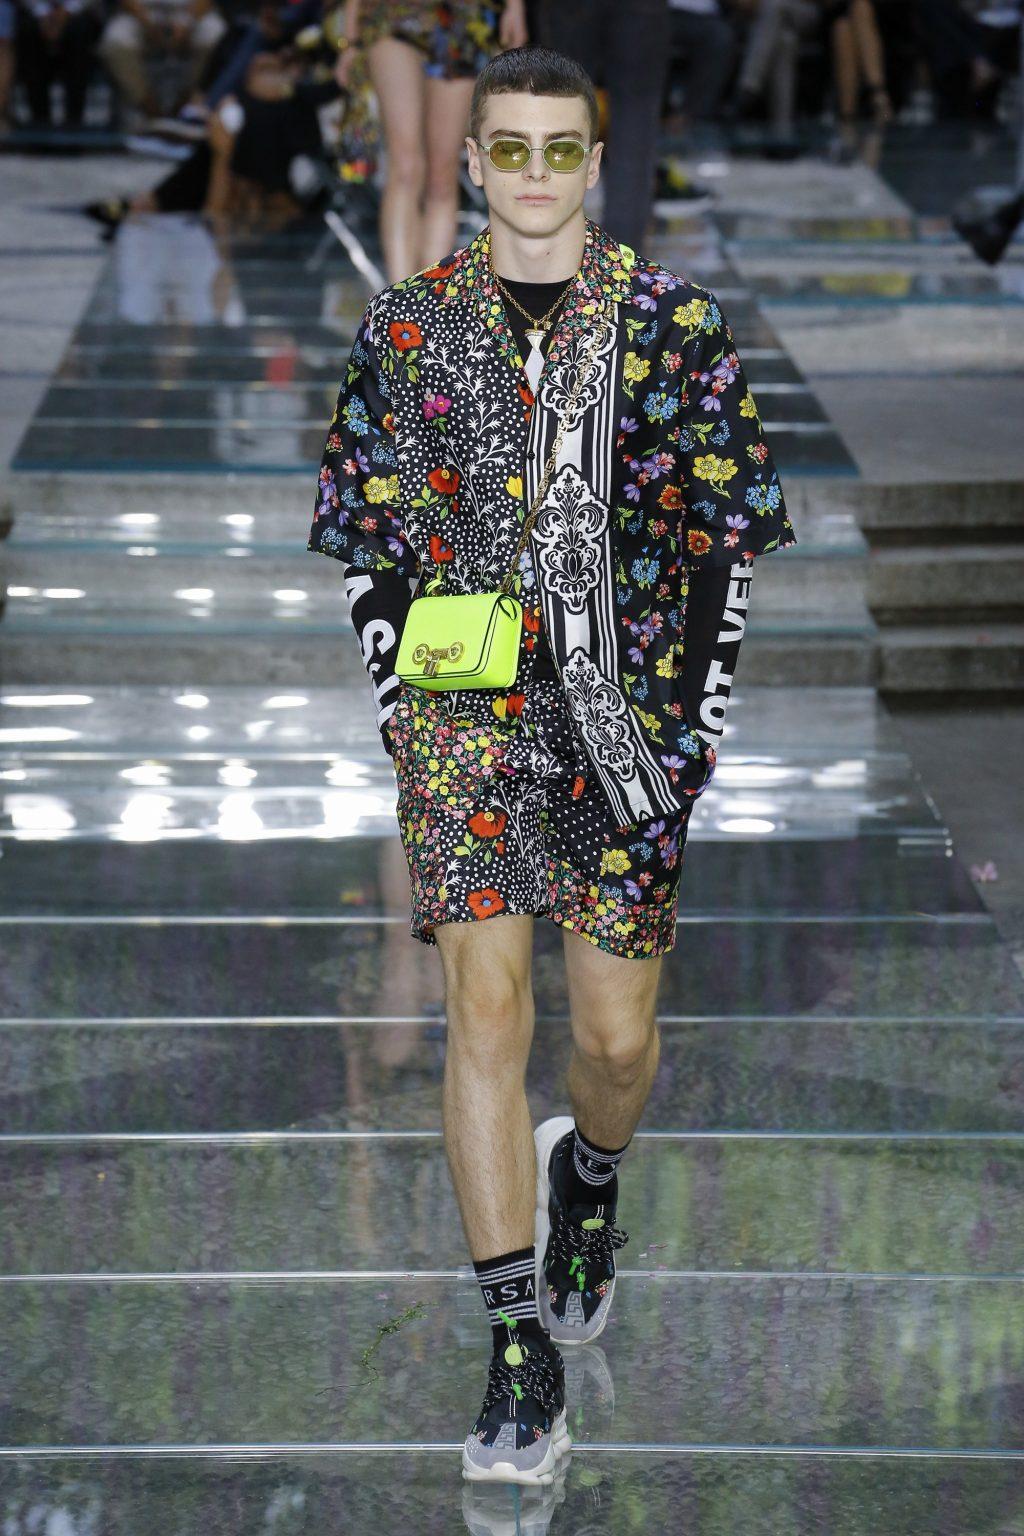 Thời trang menswear 3